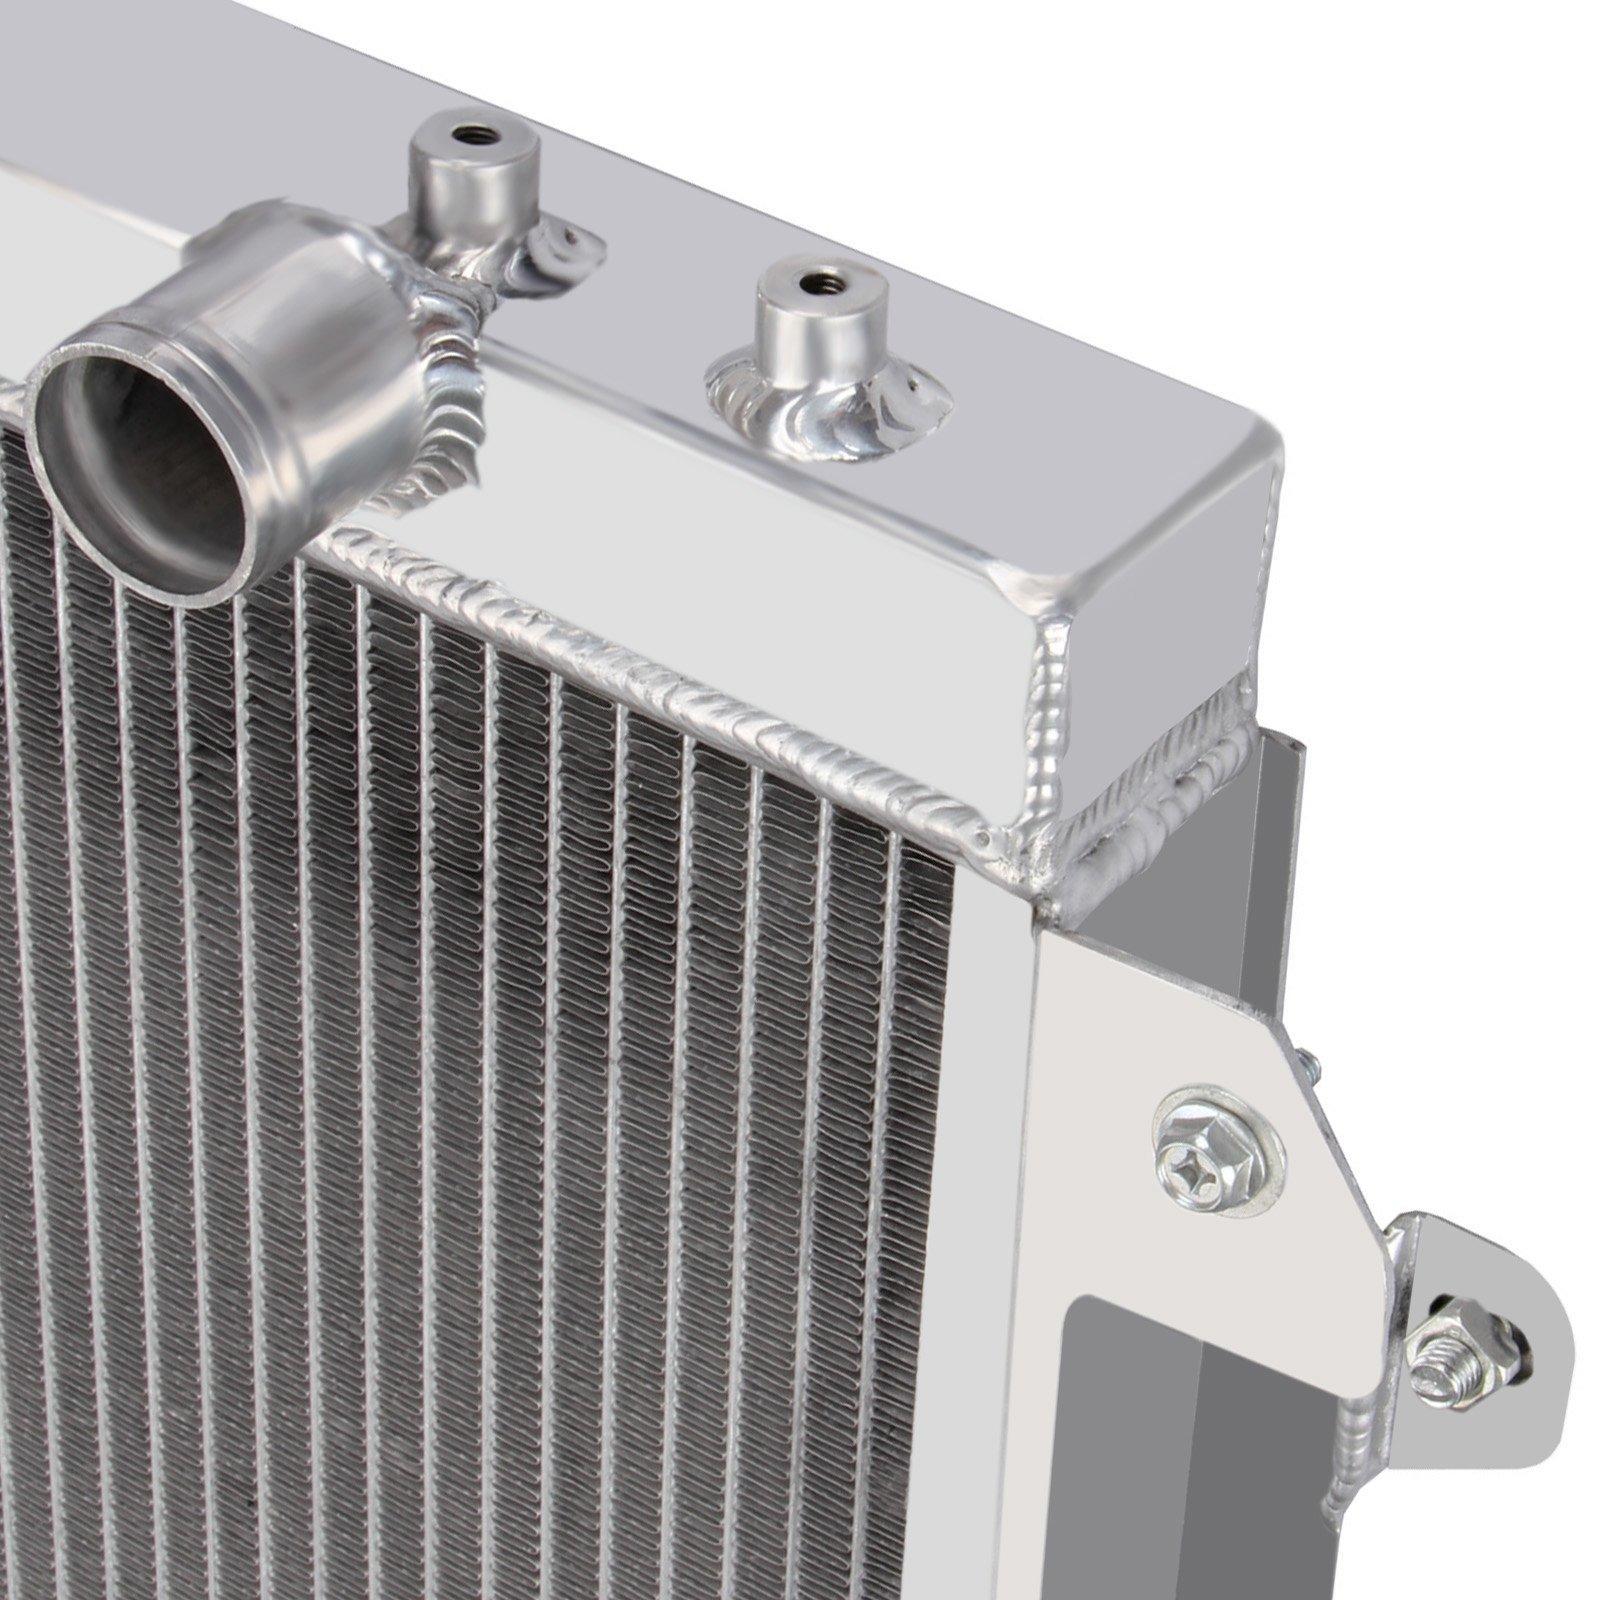 hiace 2004 ln130 rn90 2009 toyota camry radiator Dromedary Brand